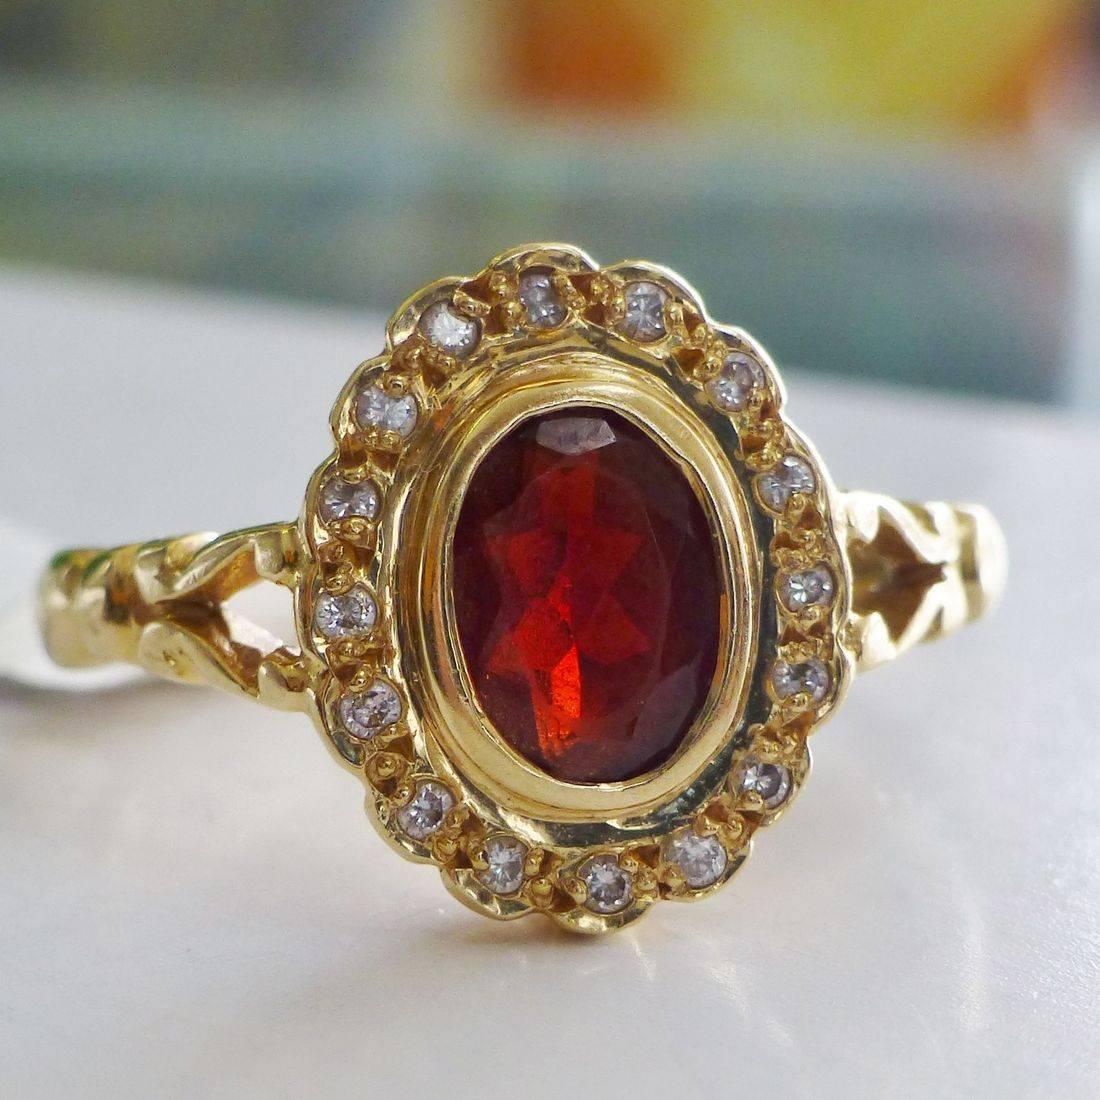 Oval Red Garnet Gemstone Framed in a Round Diamond Halo in 14K Yellow Gold